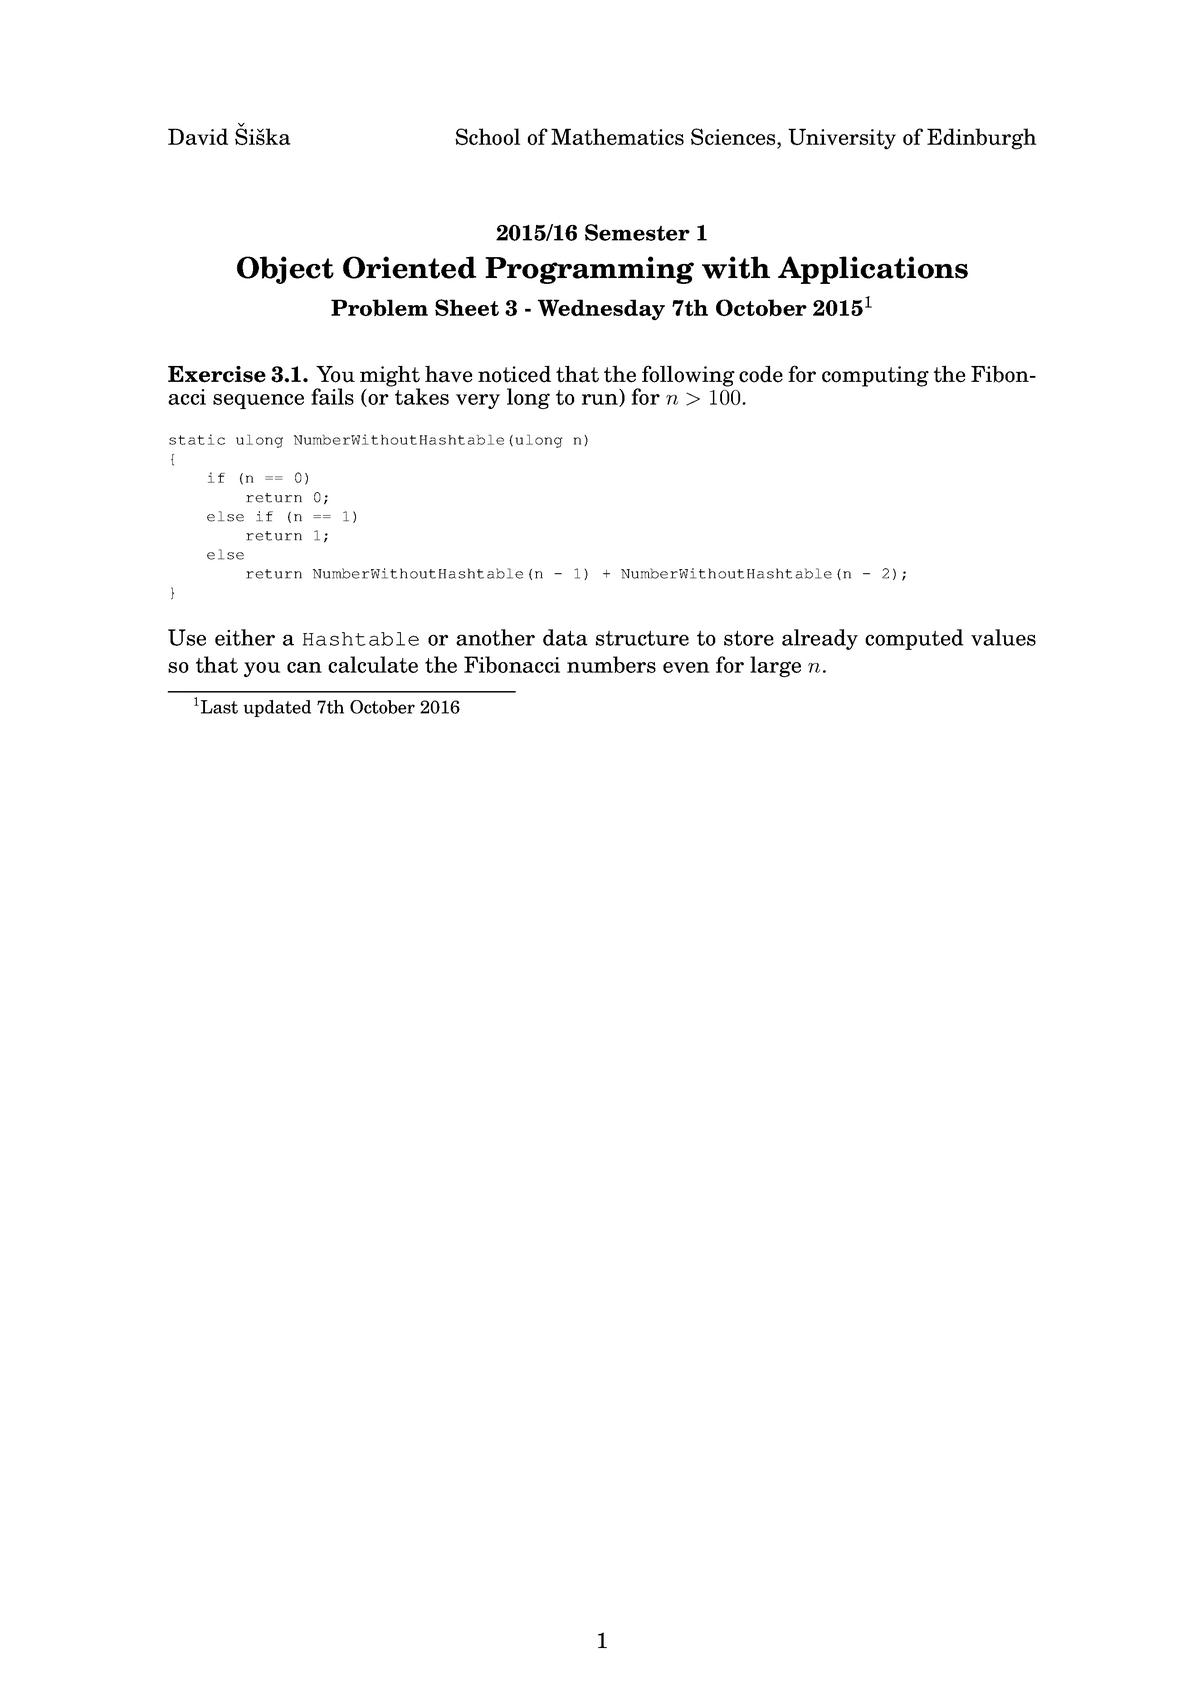 Problem Set 3 - 7th October 2015 - MATH11152: Object